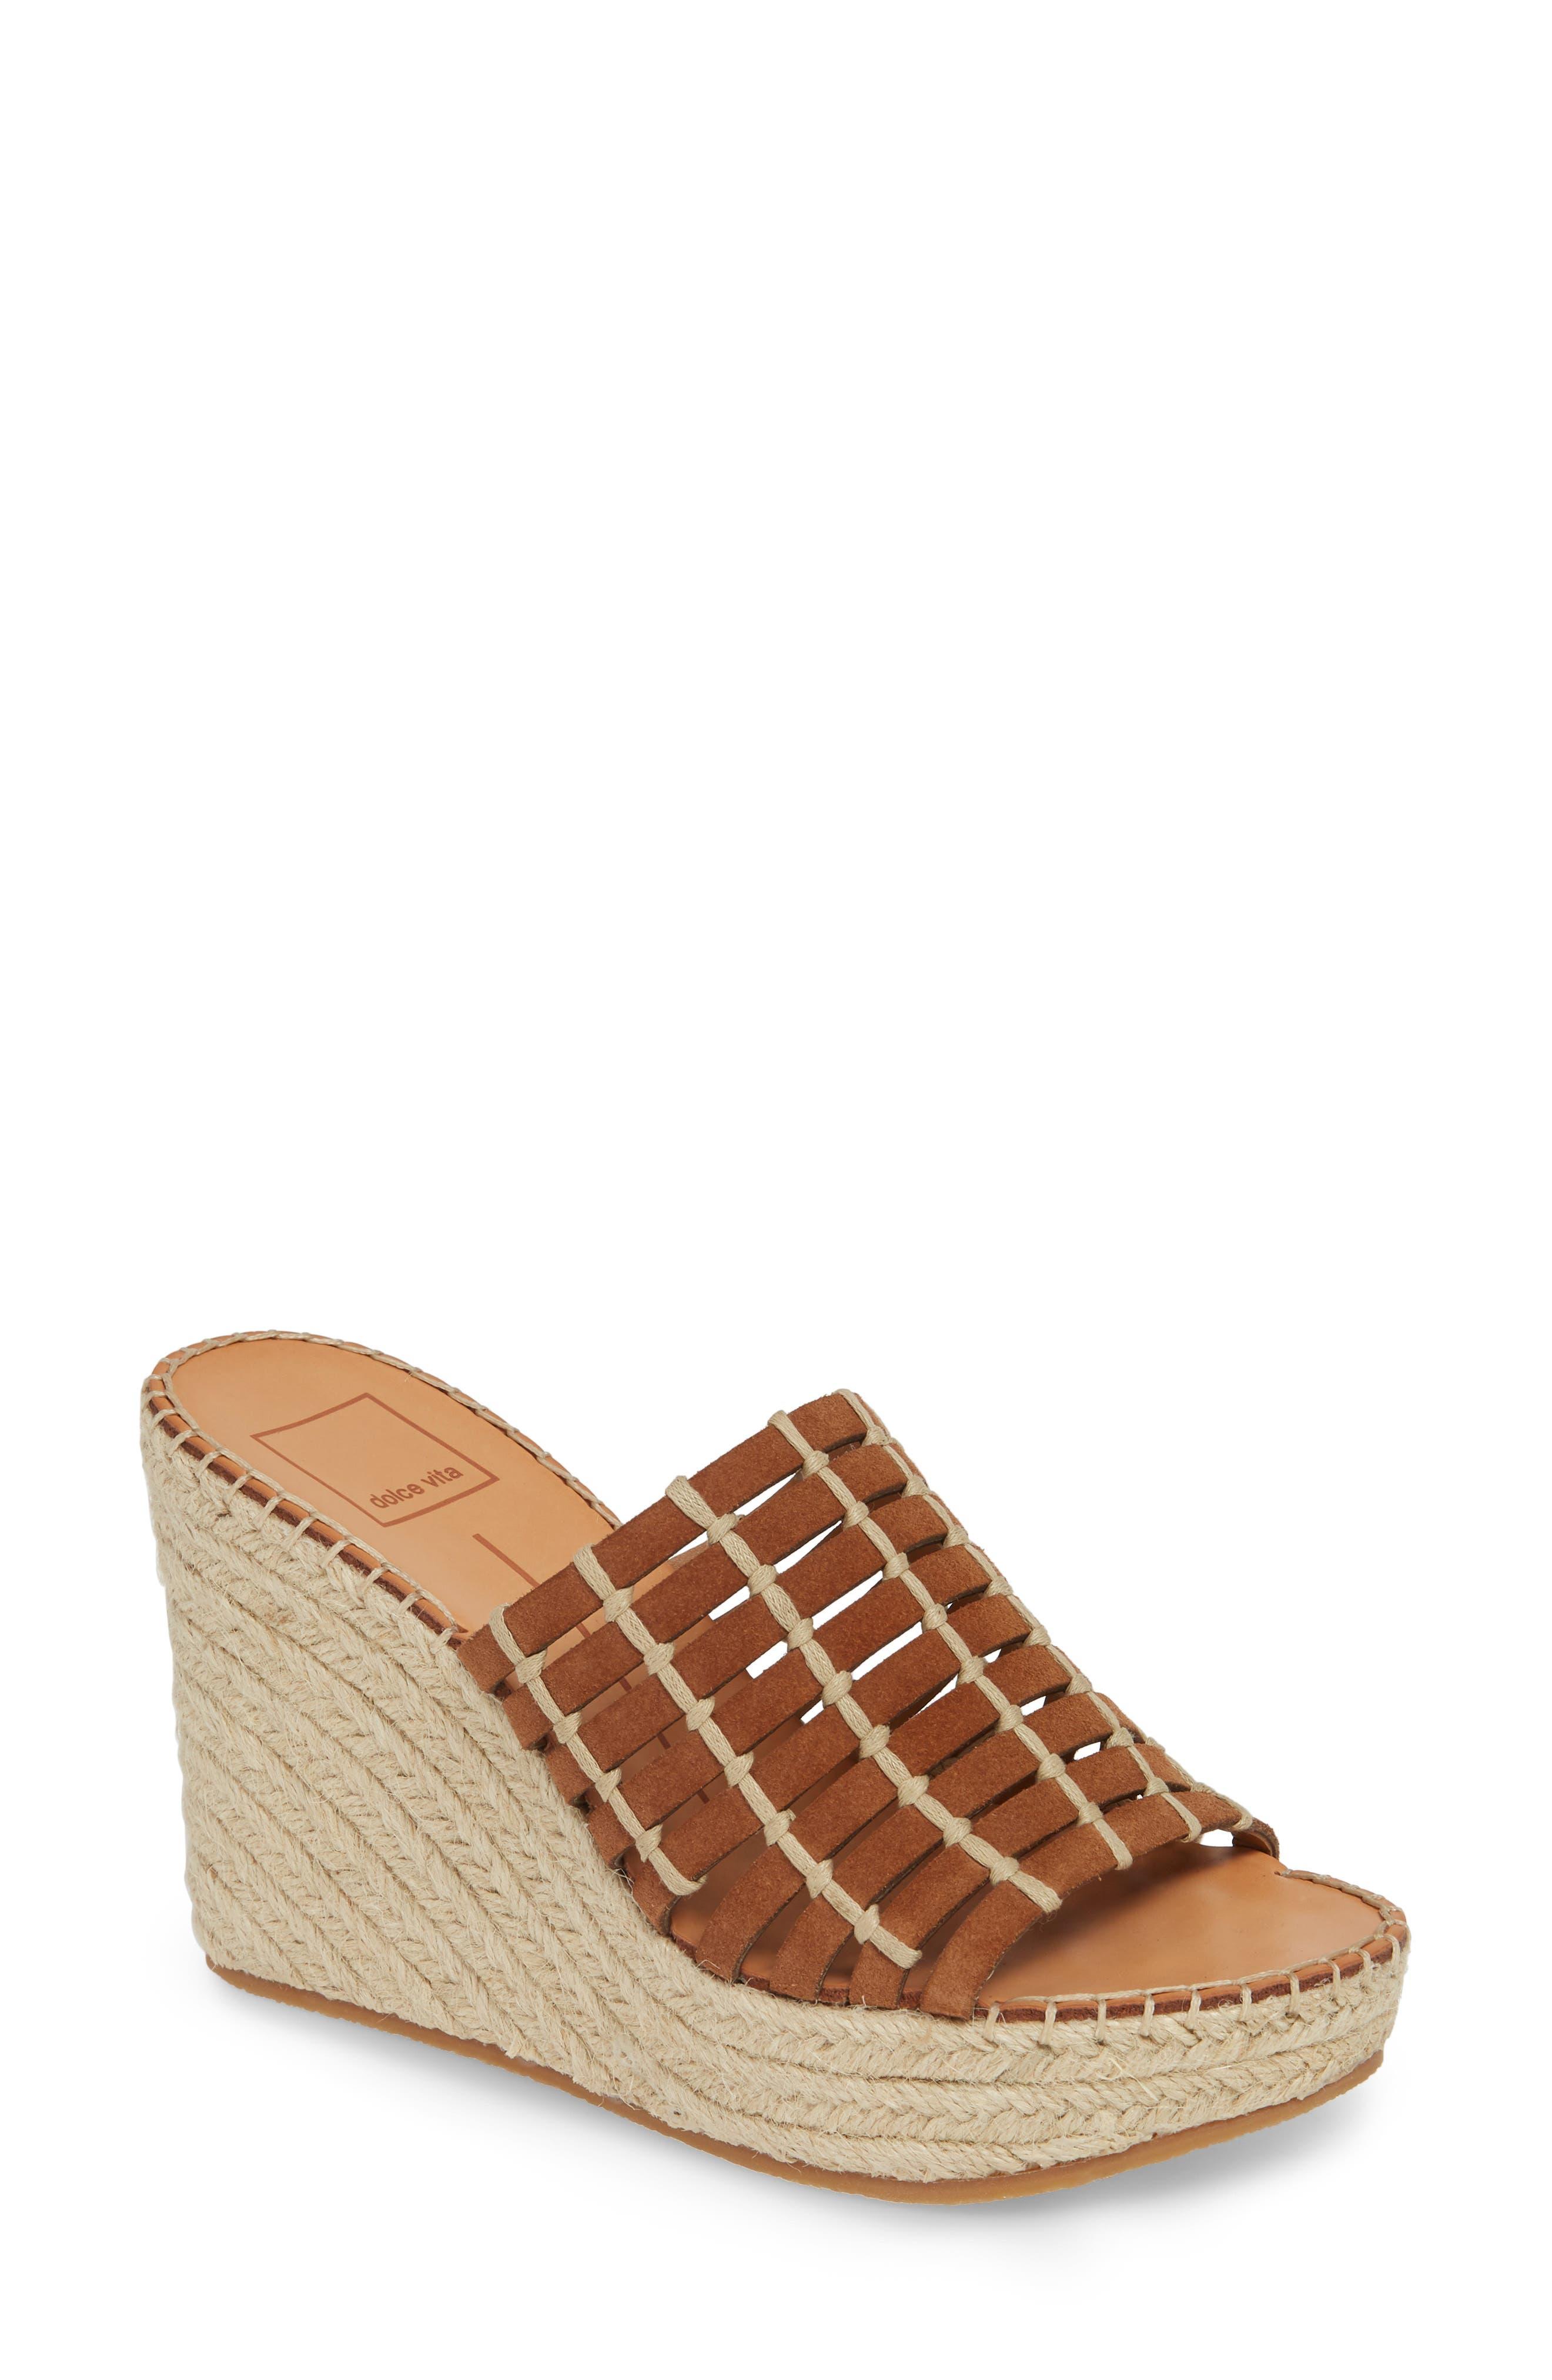 Dolce Vita Prue Espadrille Wedge Slide Sandal, Brown